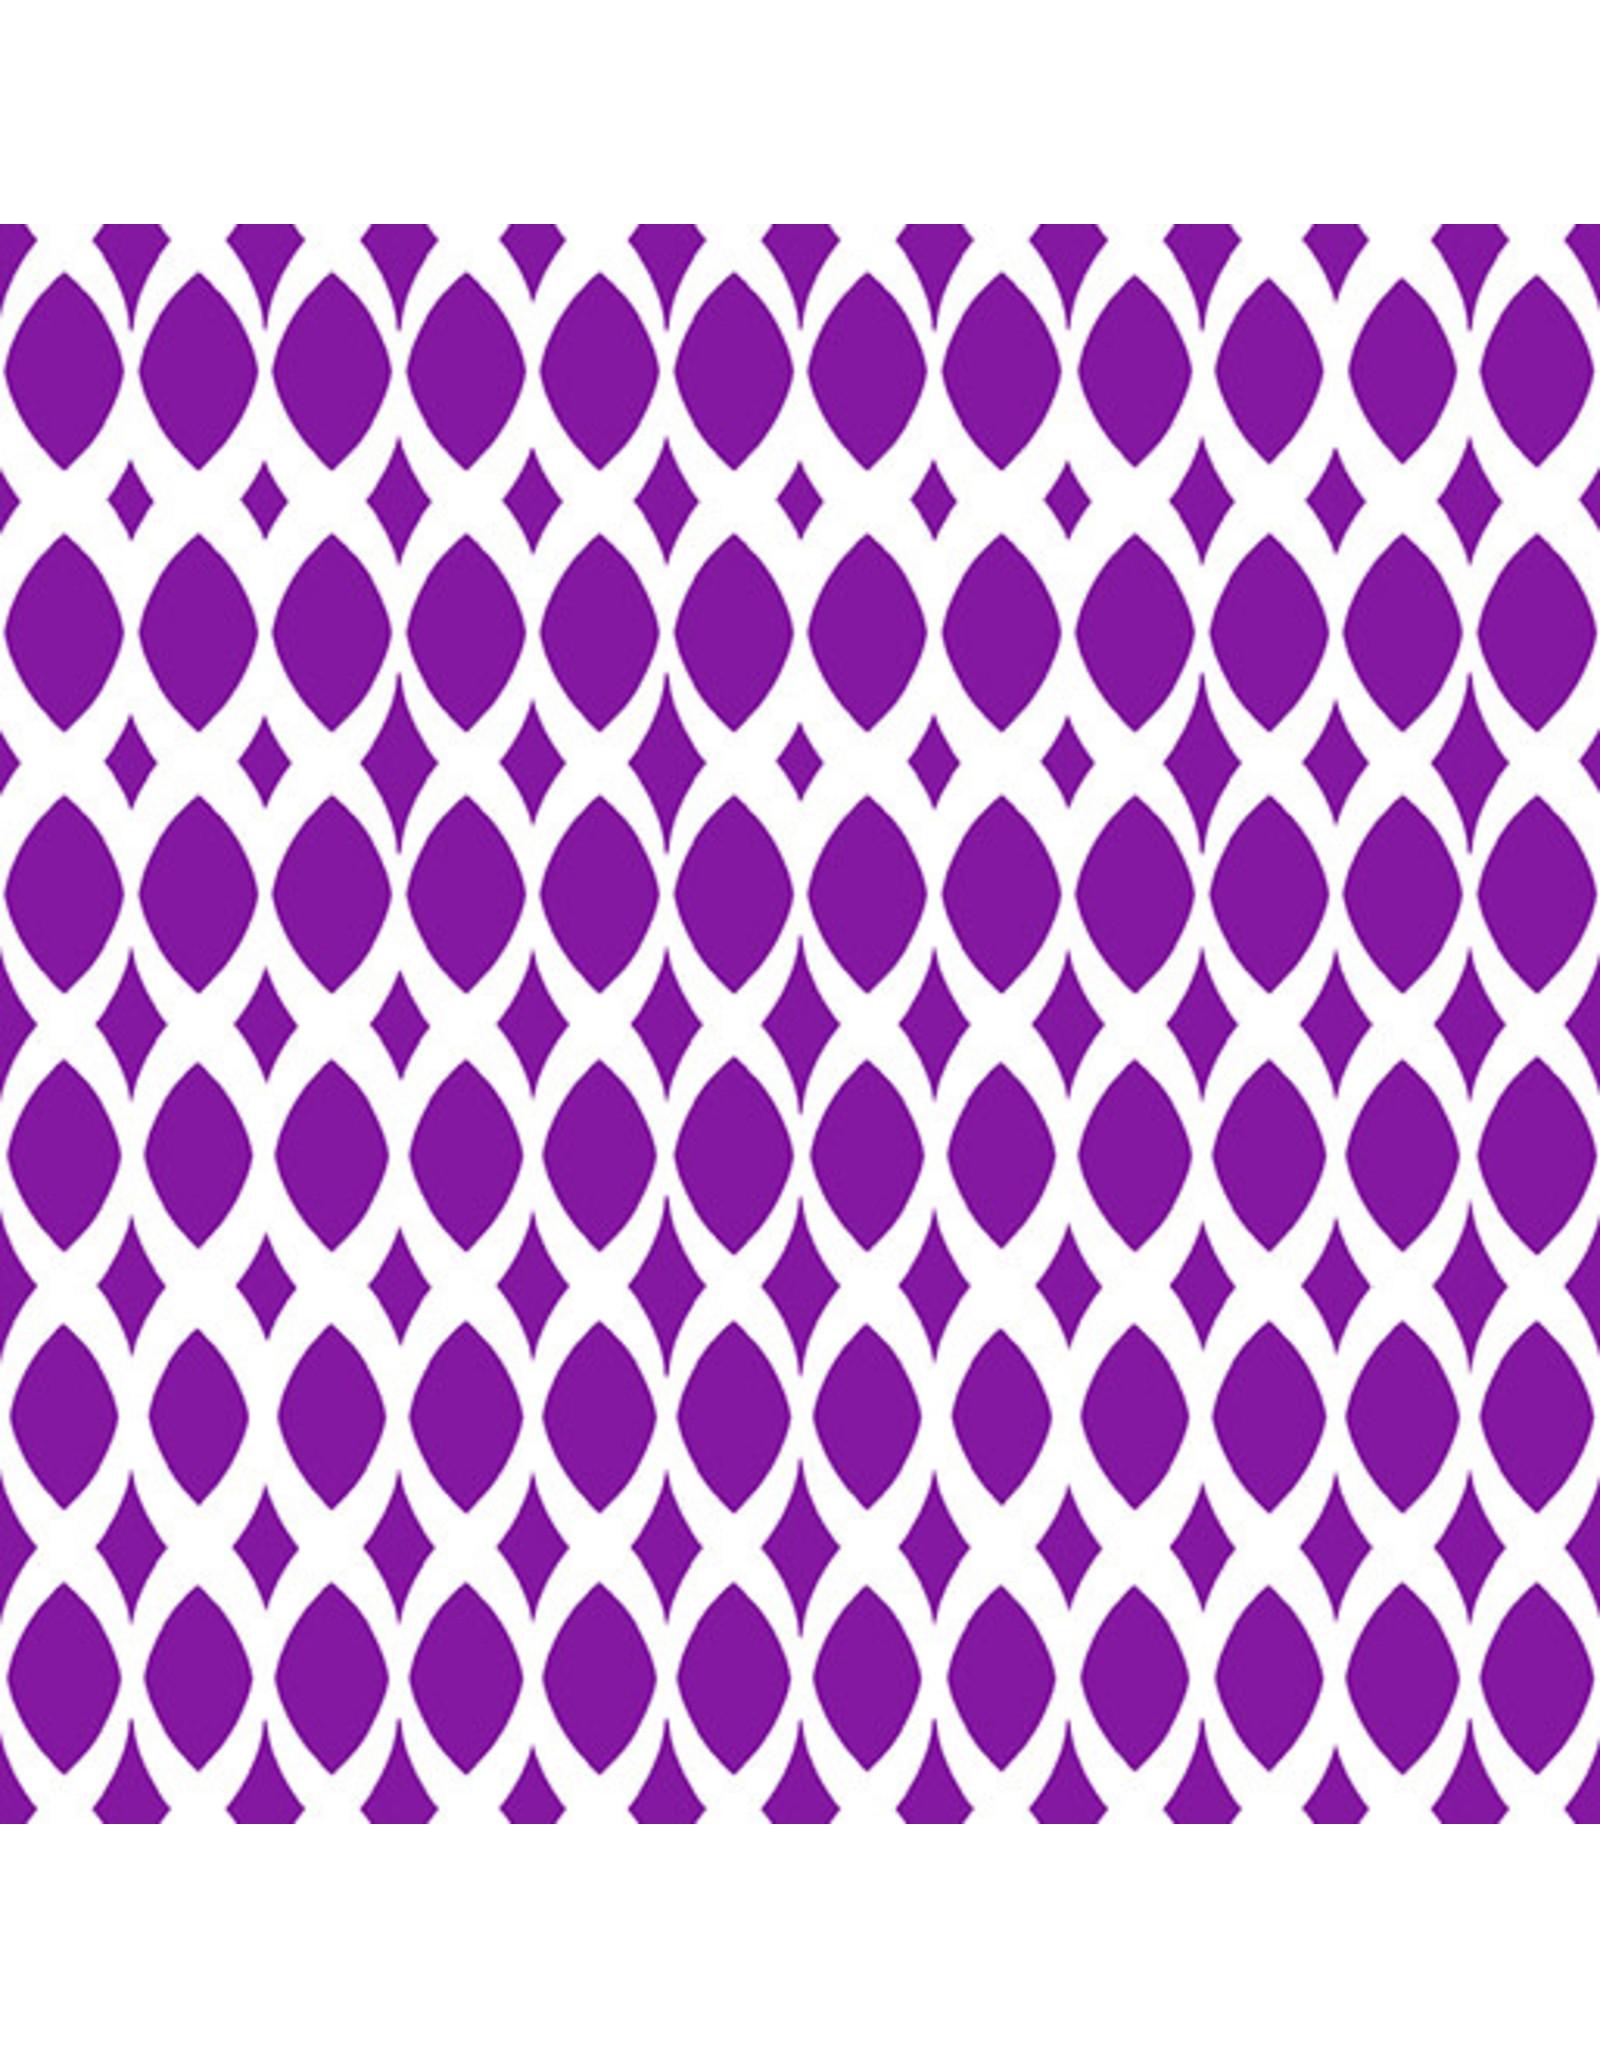 Contempo Gridwork - Diamond Ovals Purple